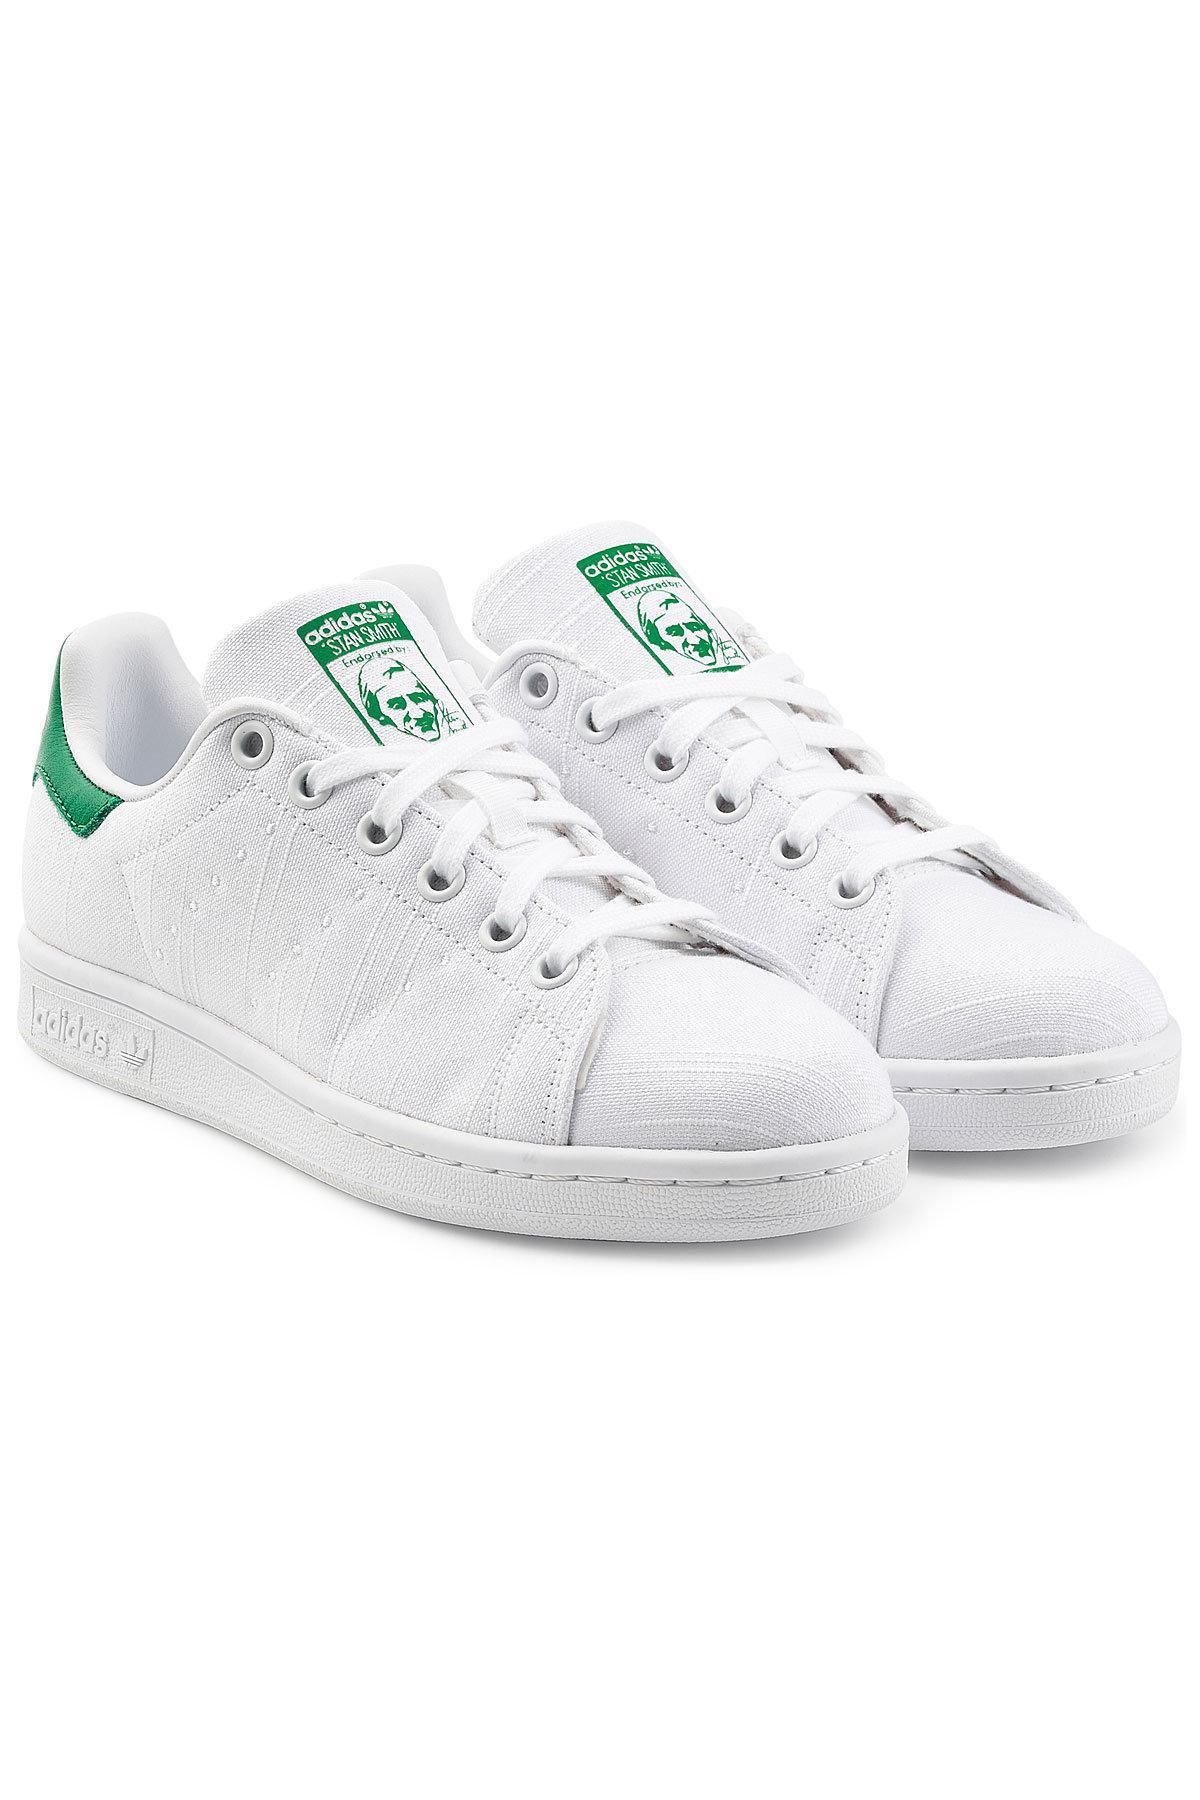 lyst adidas originali stan smith ricamati tela scarpe bianche